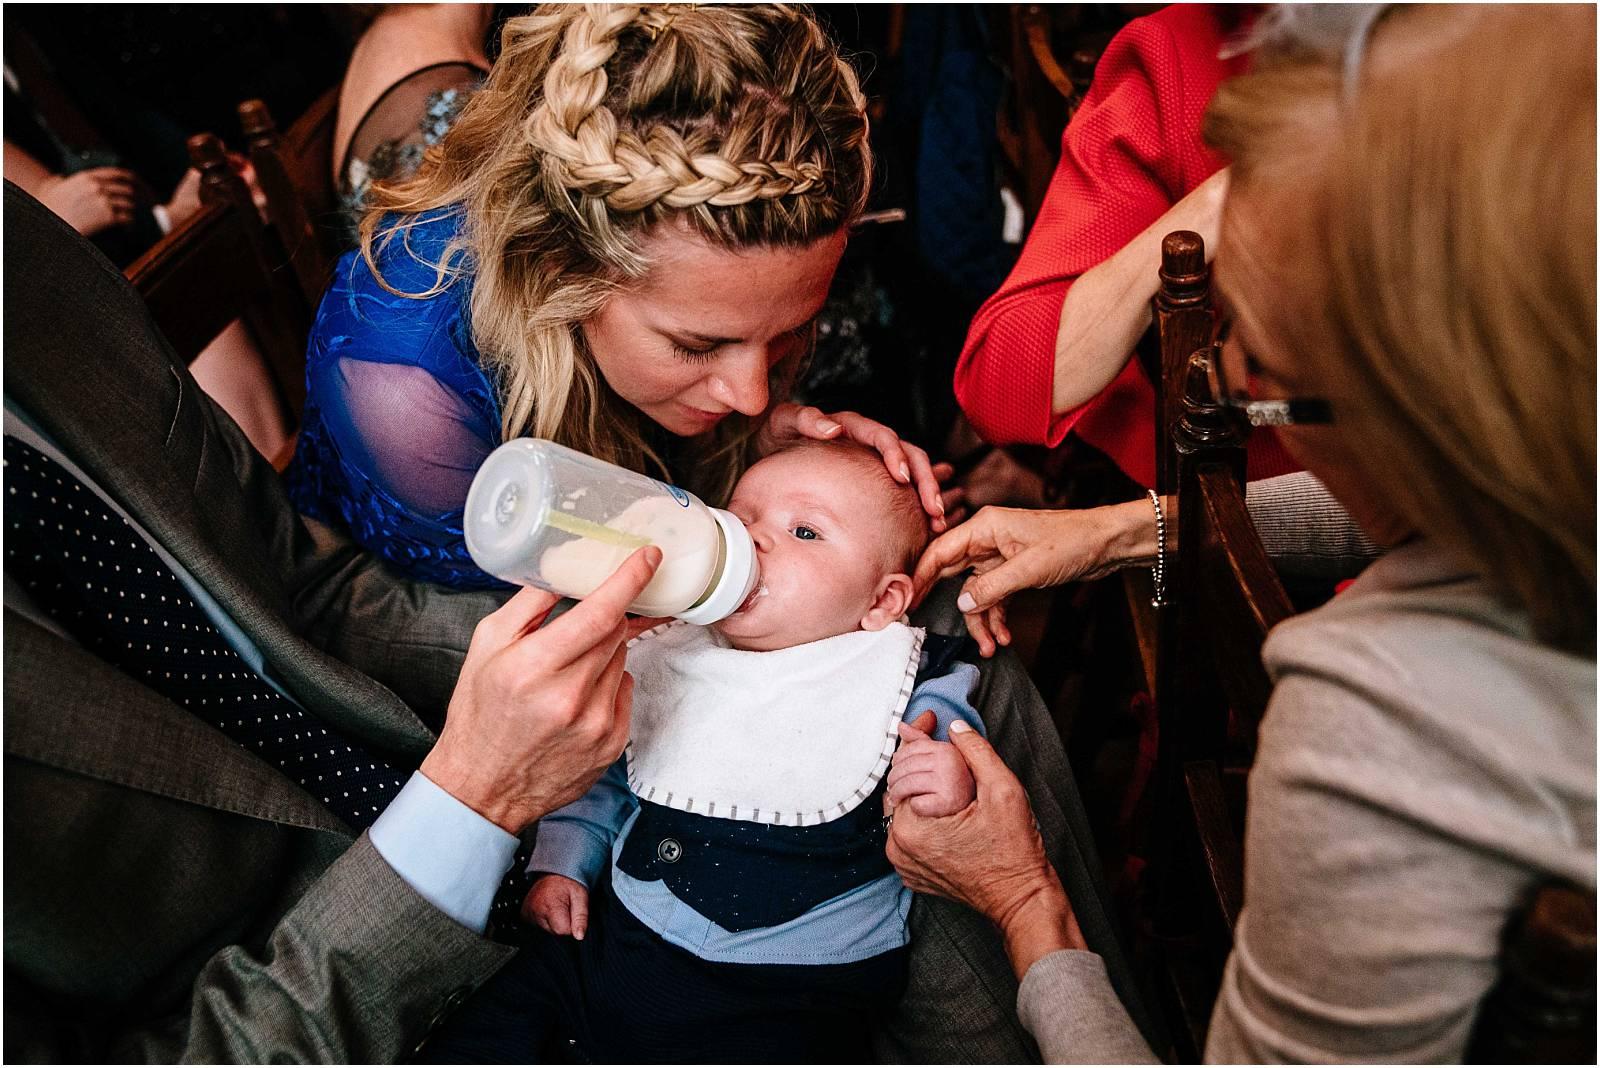 little baby at wedding